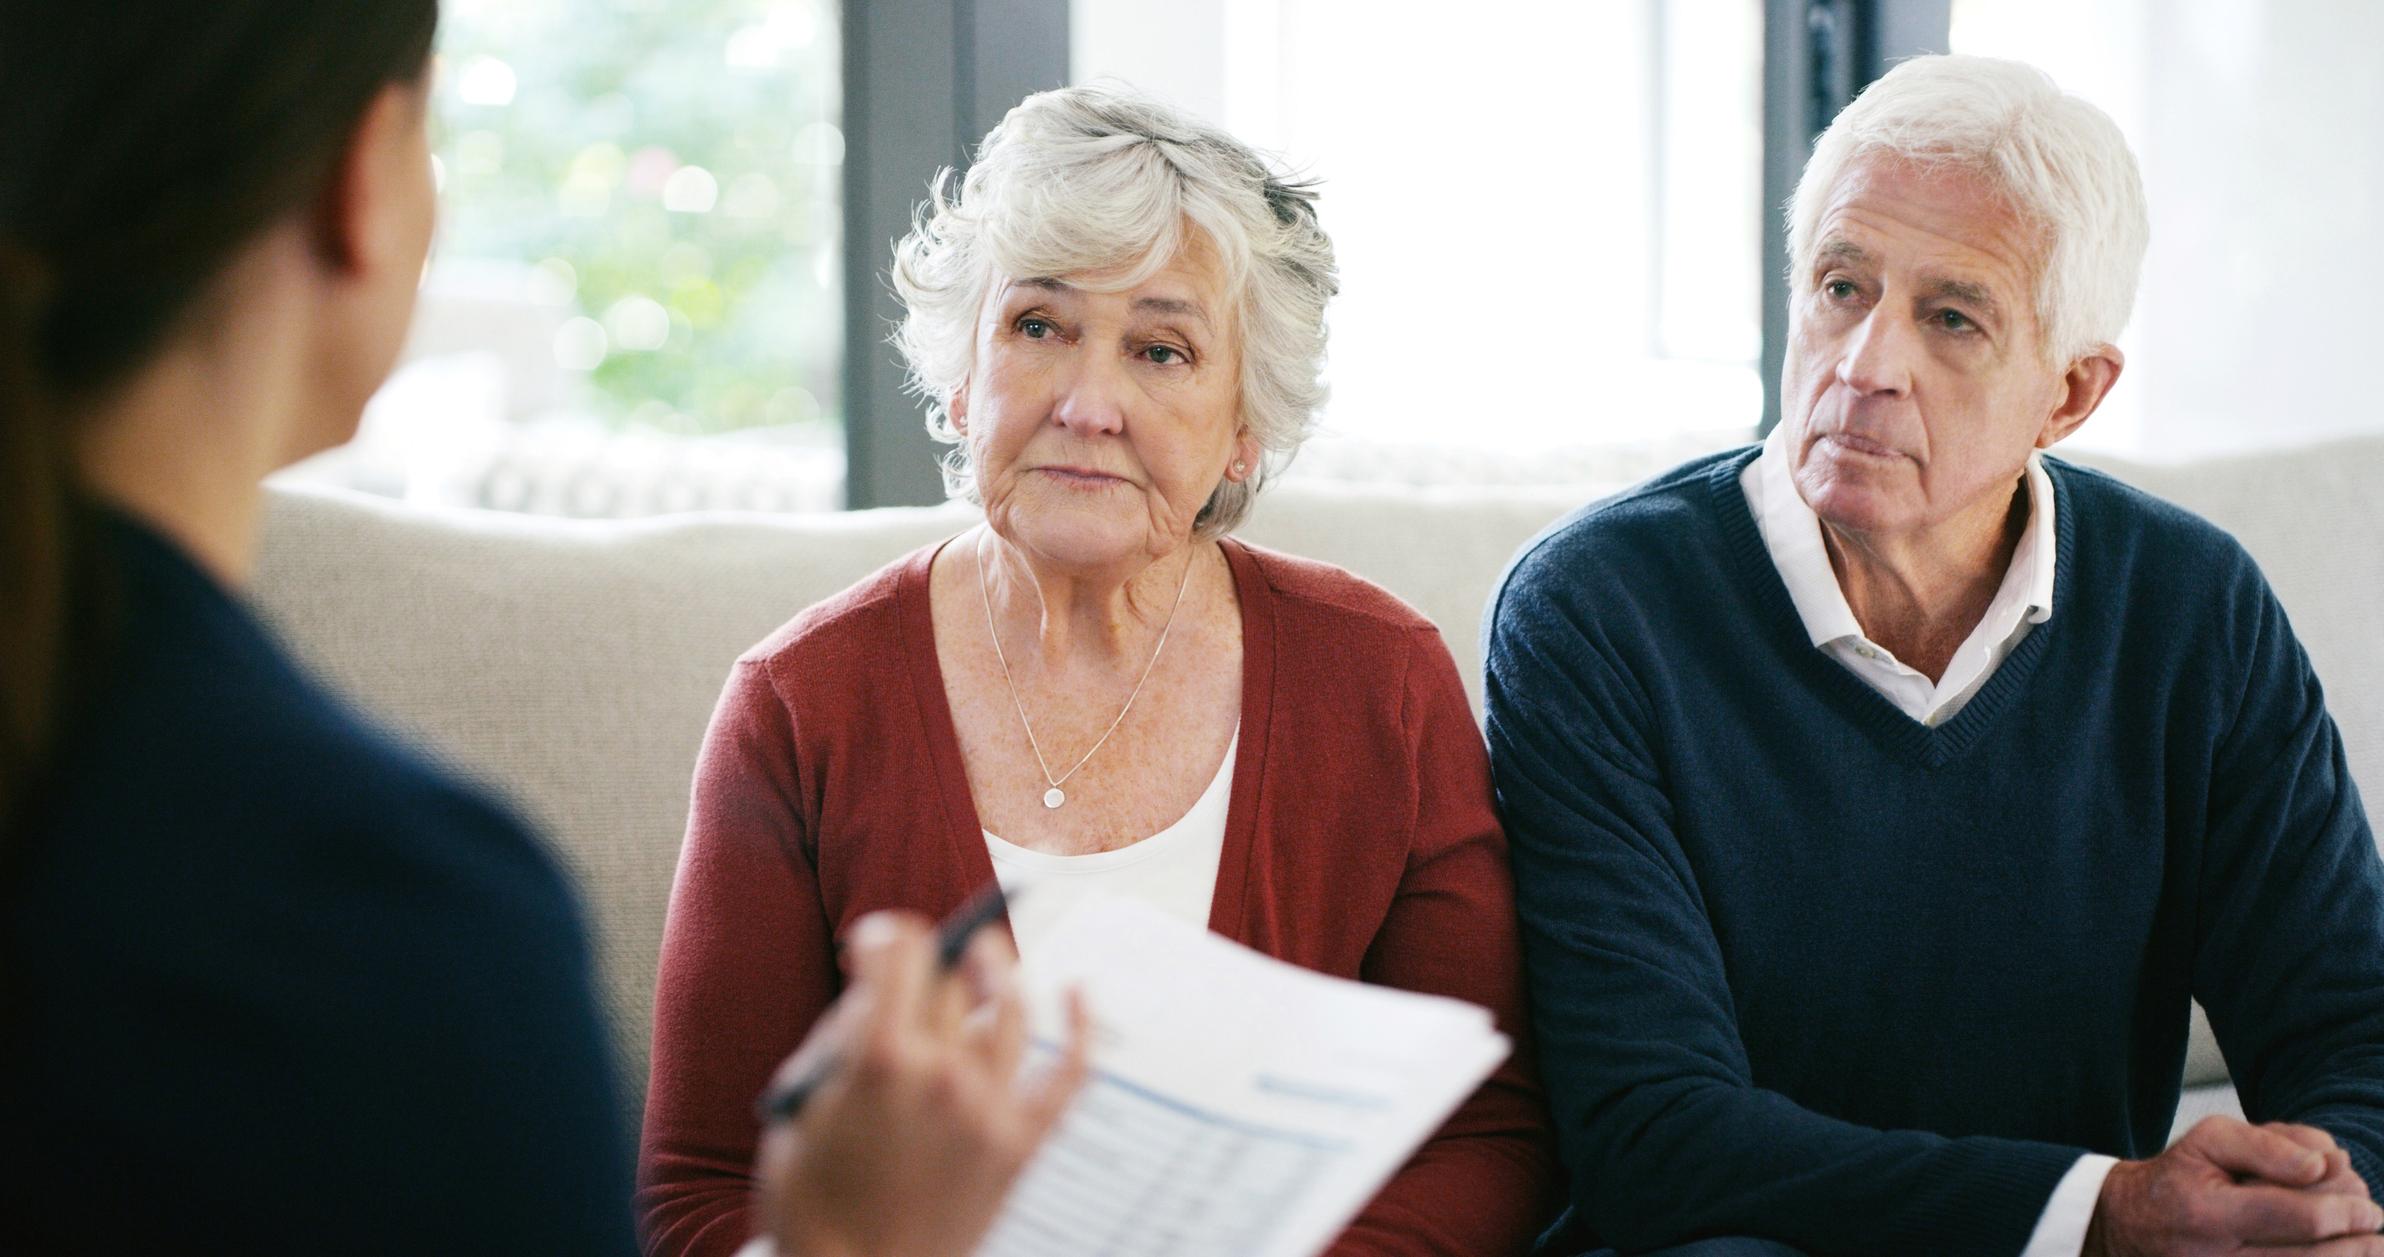 Leibrente: Sinnvolle Altersvorsorge?